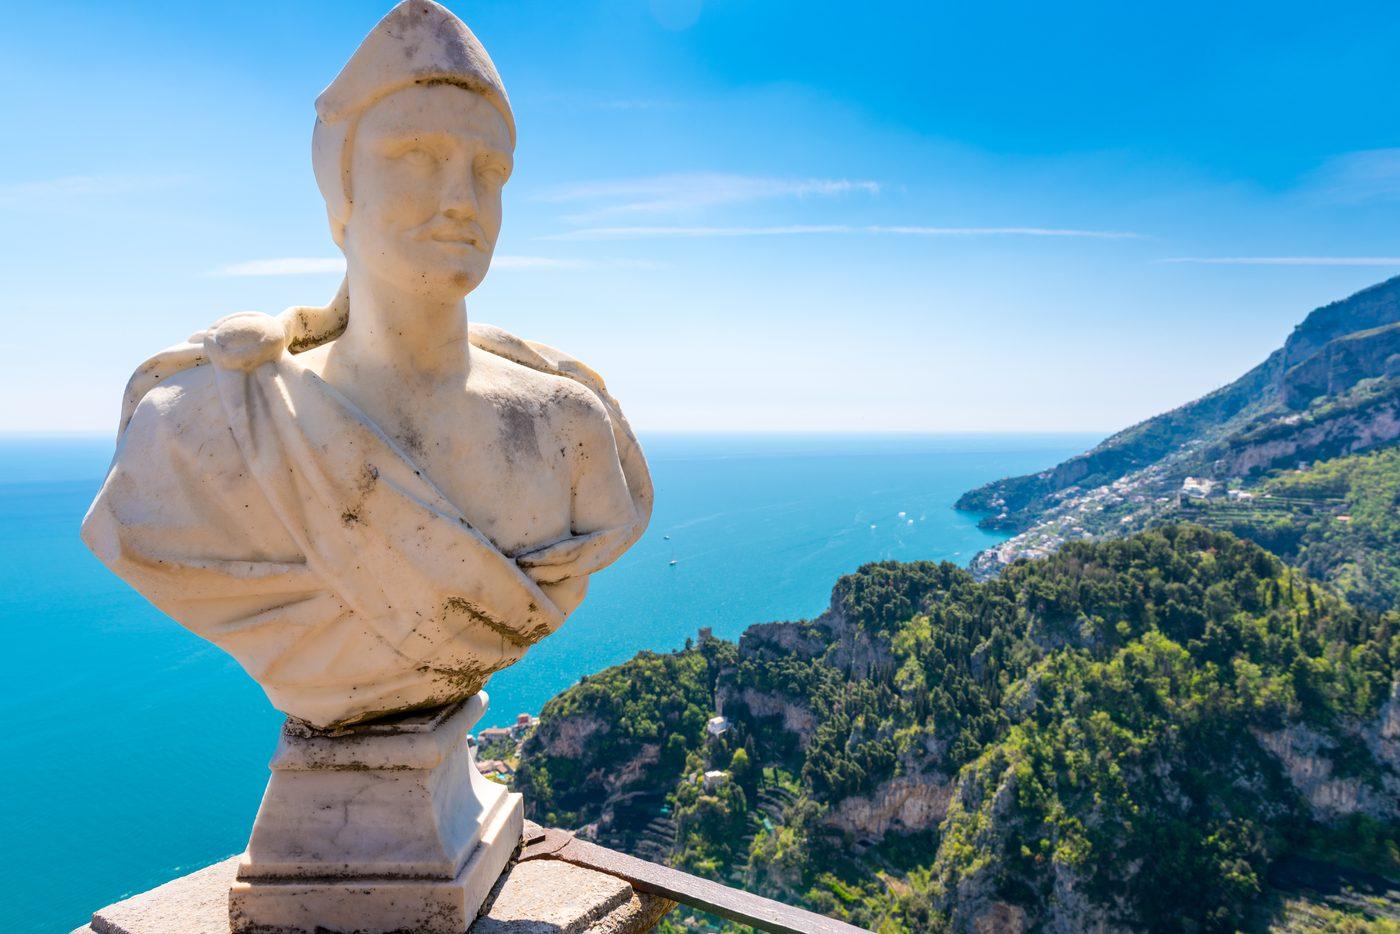 Statue of Augustus Caesar overlooking the coast of island c